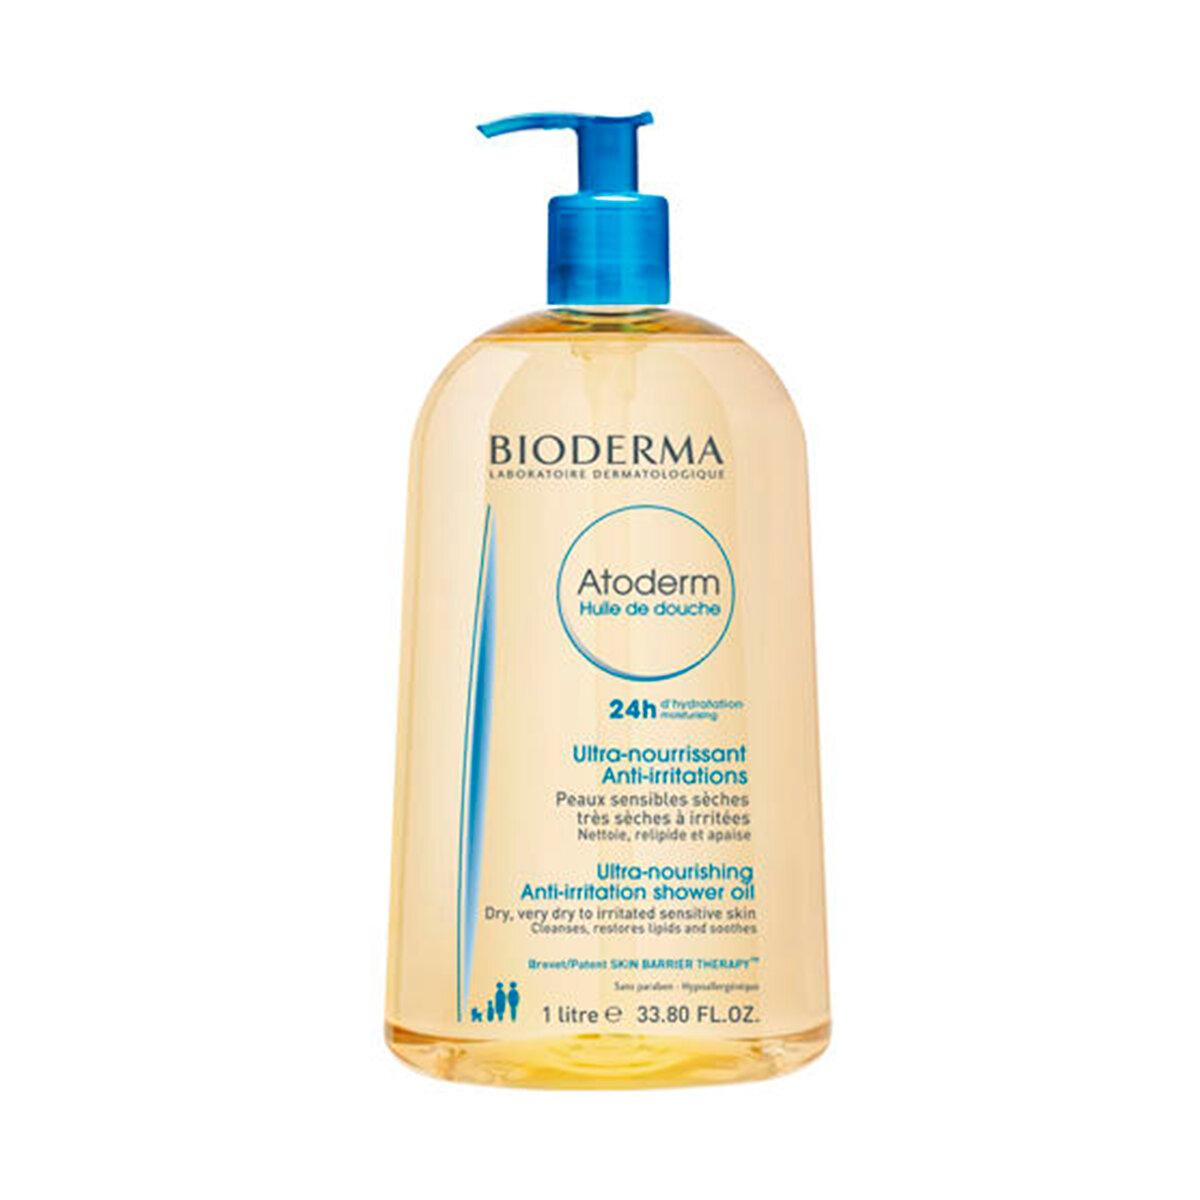 Взгляд химика на состав масла для душа Bioderma Atoderm